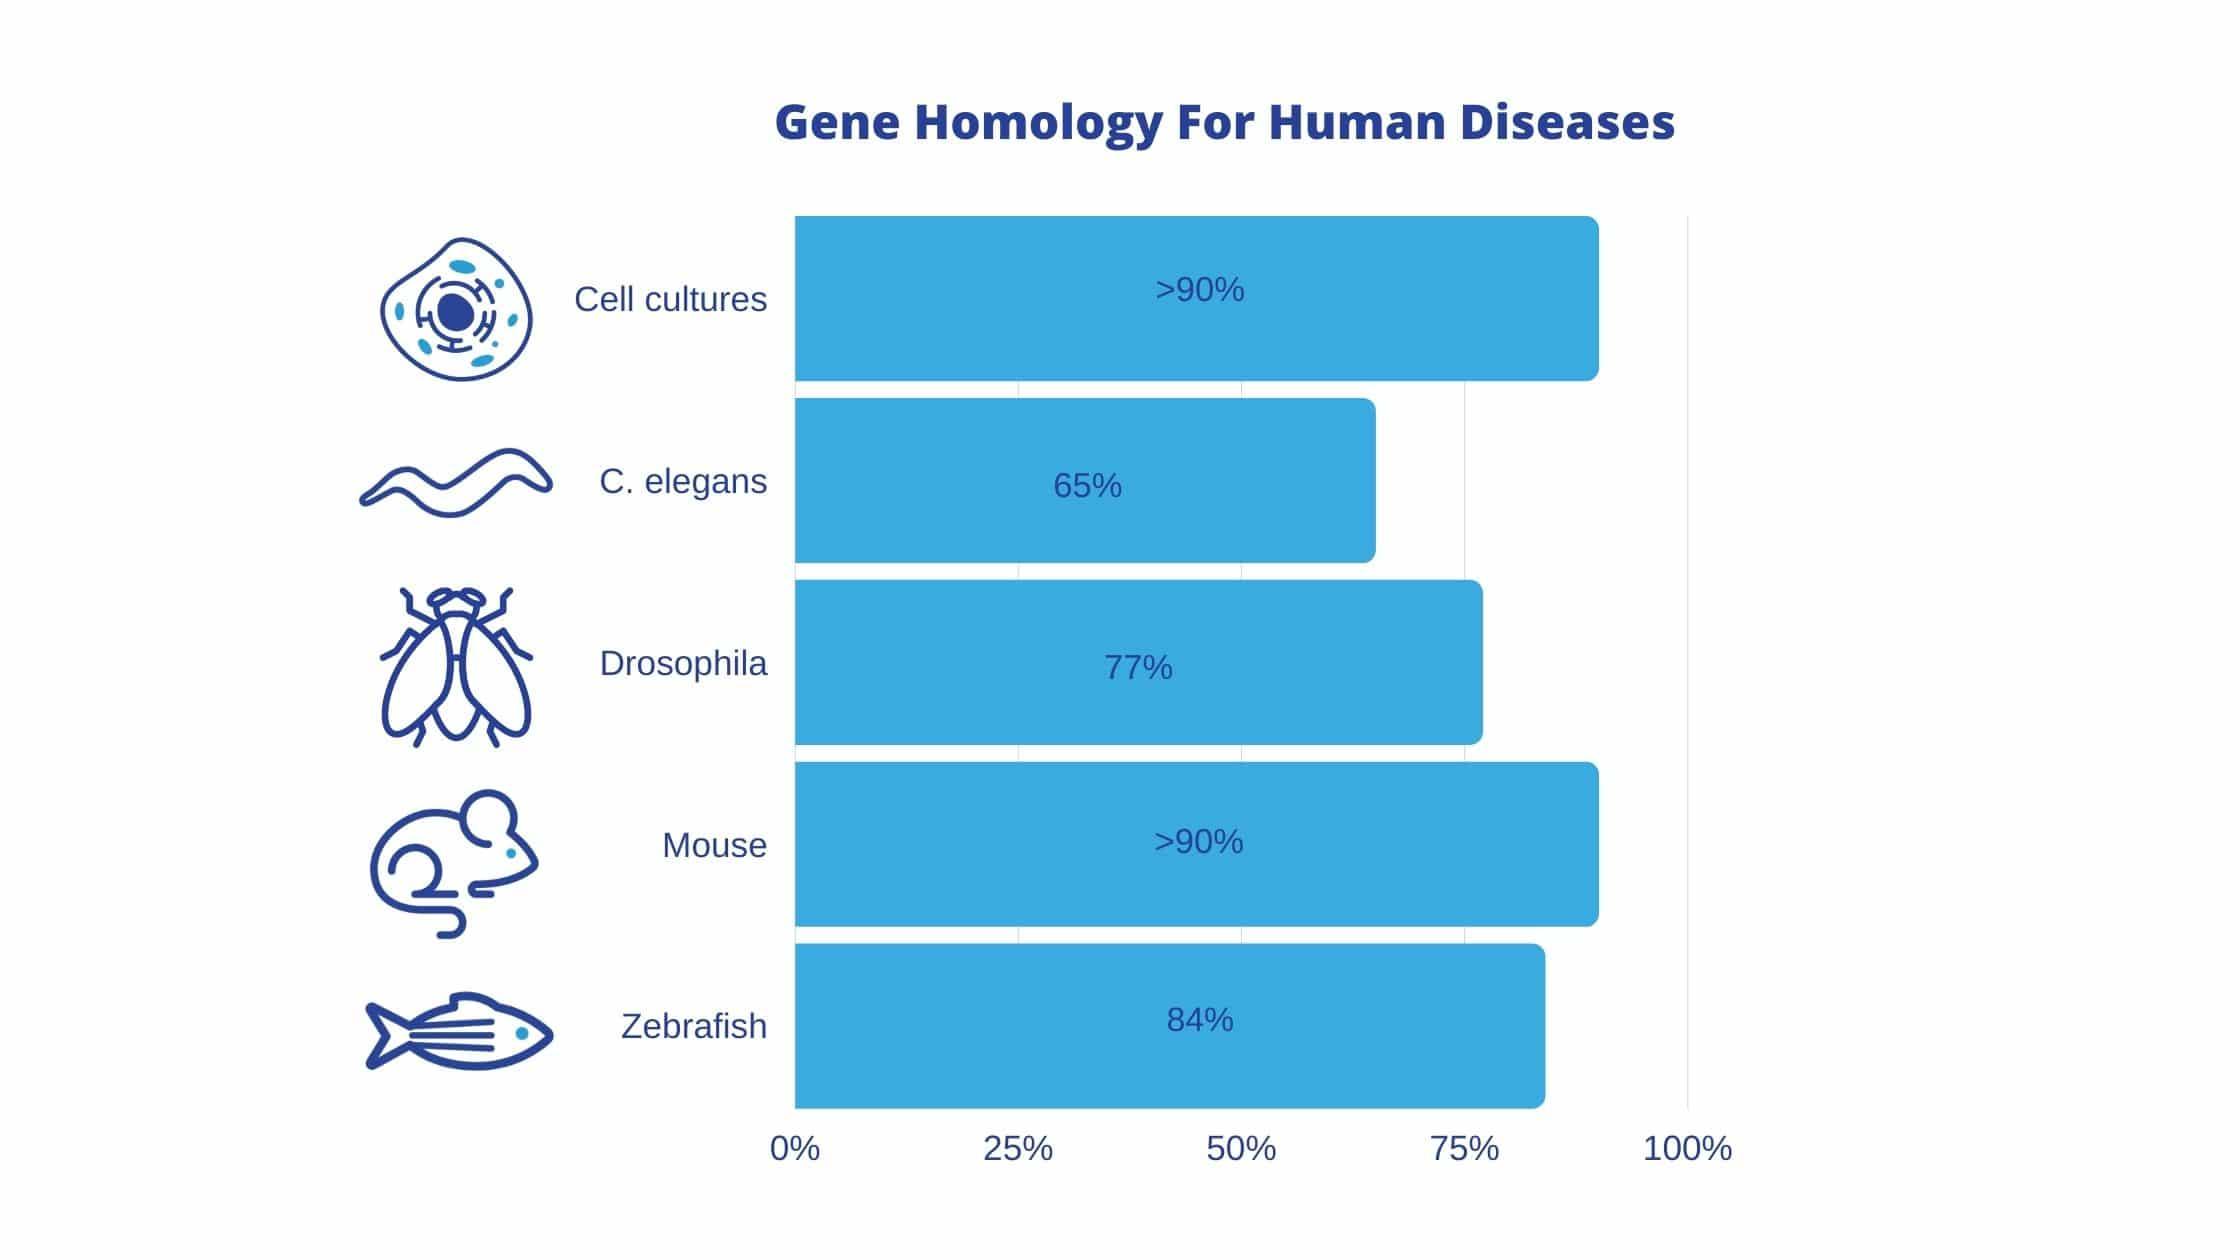 Gene homology for human diseases